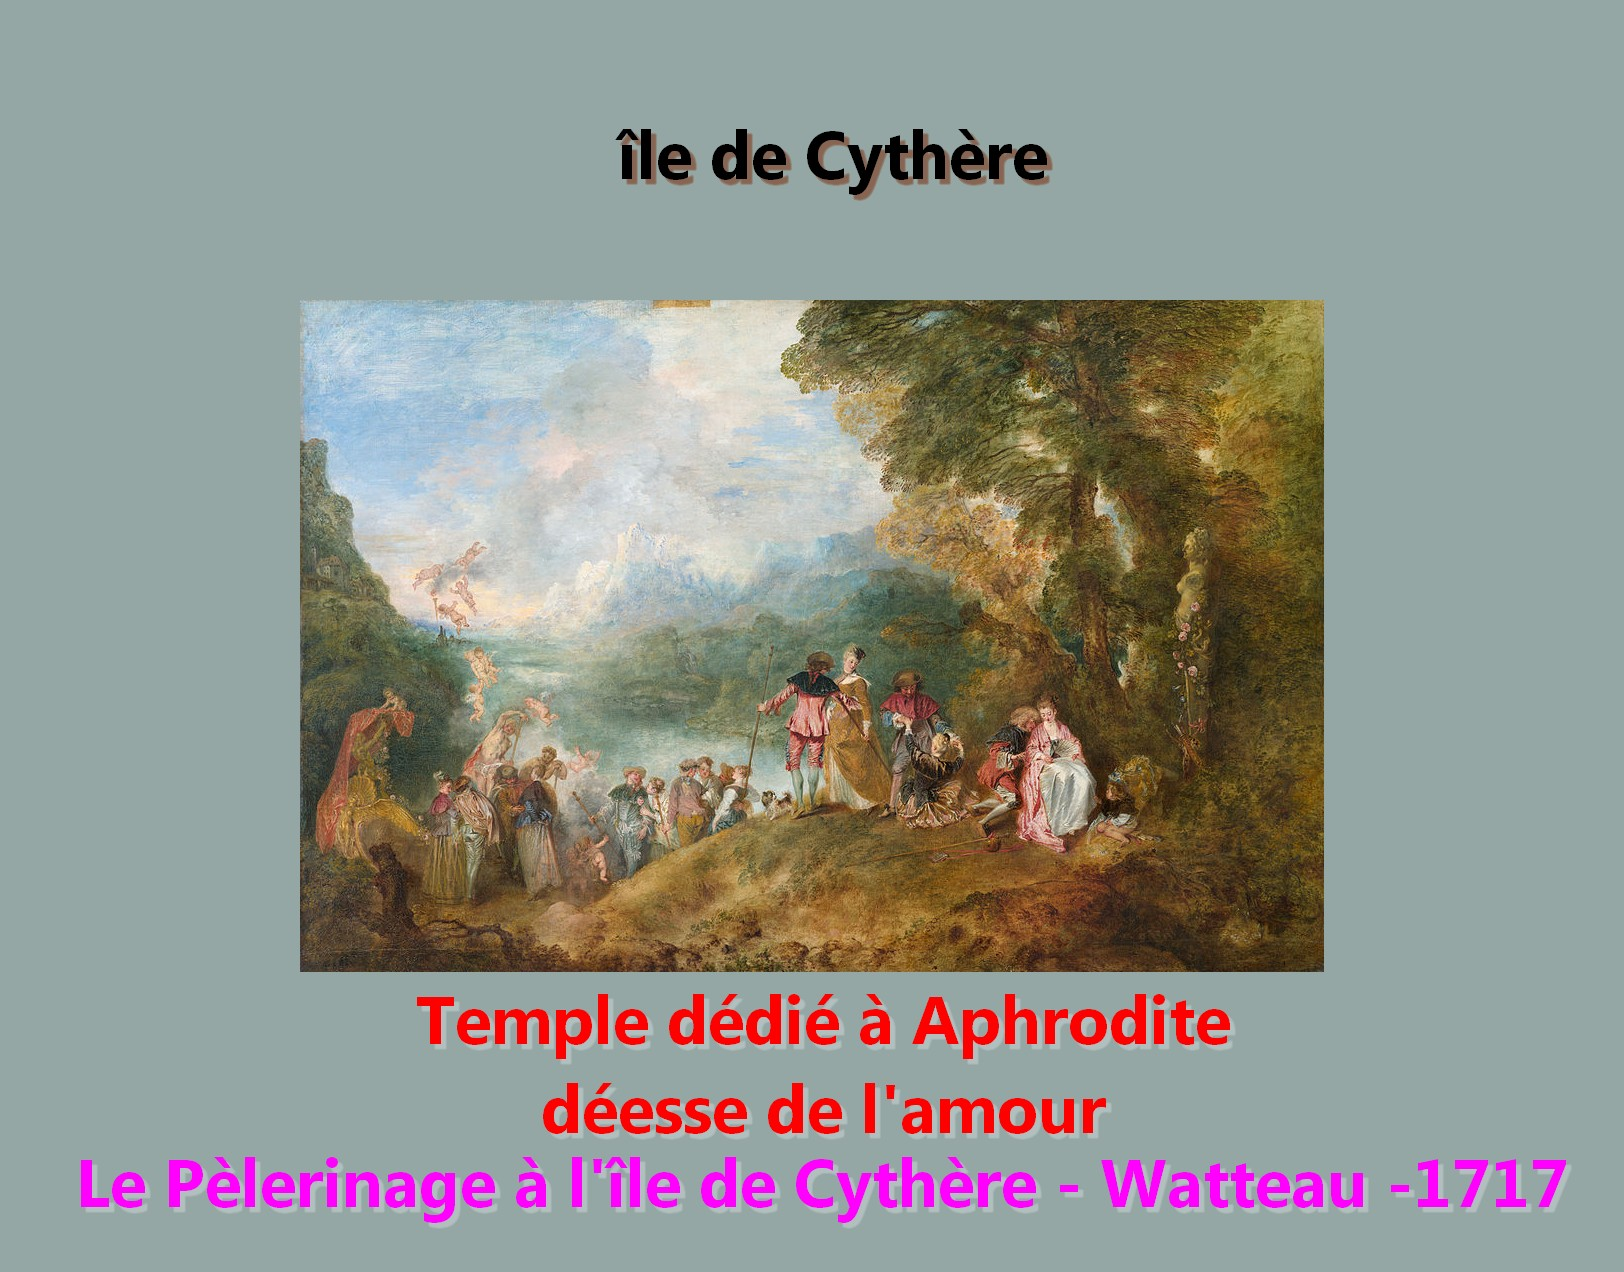 L'Embarquement_pour_Cythere Antoine_Watteau